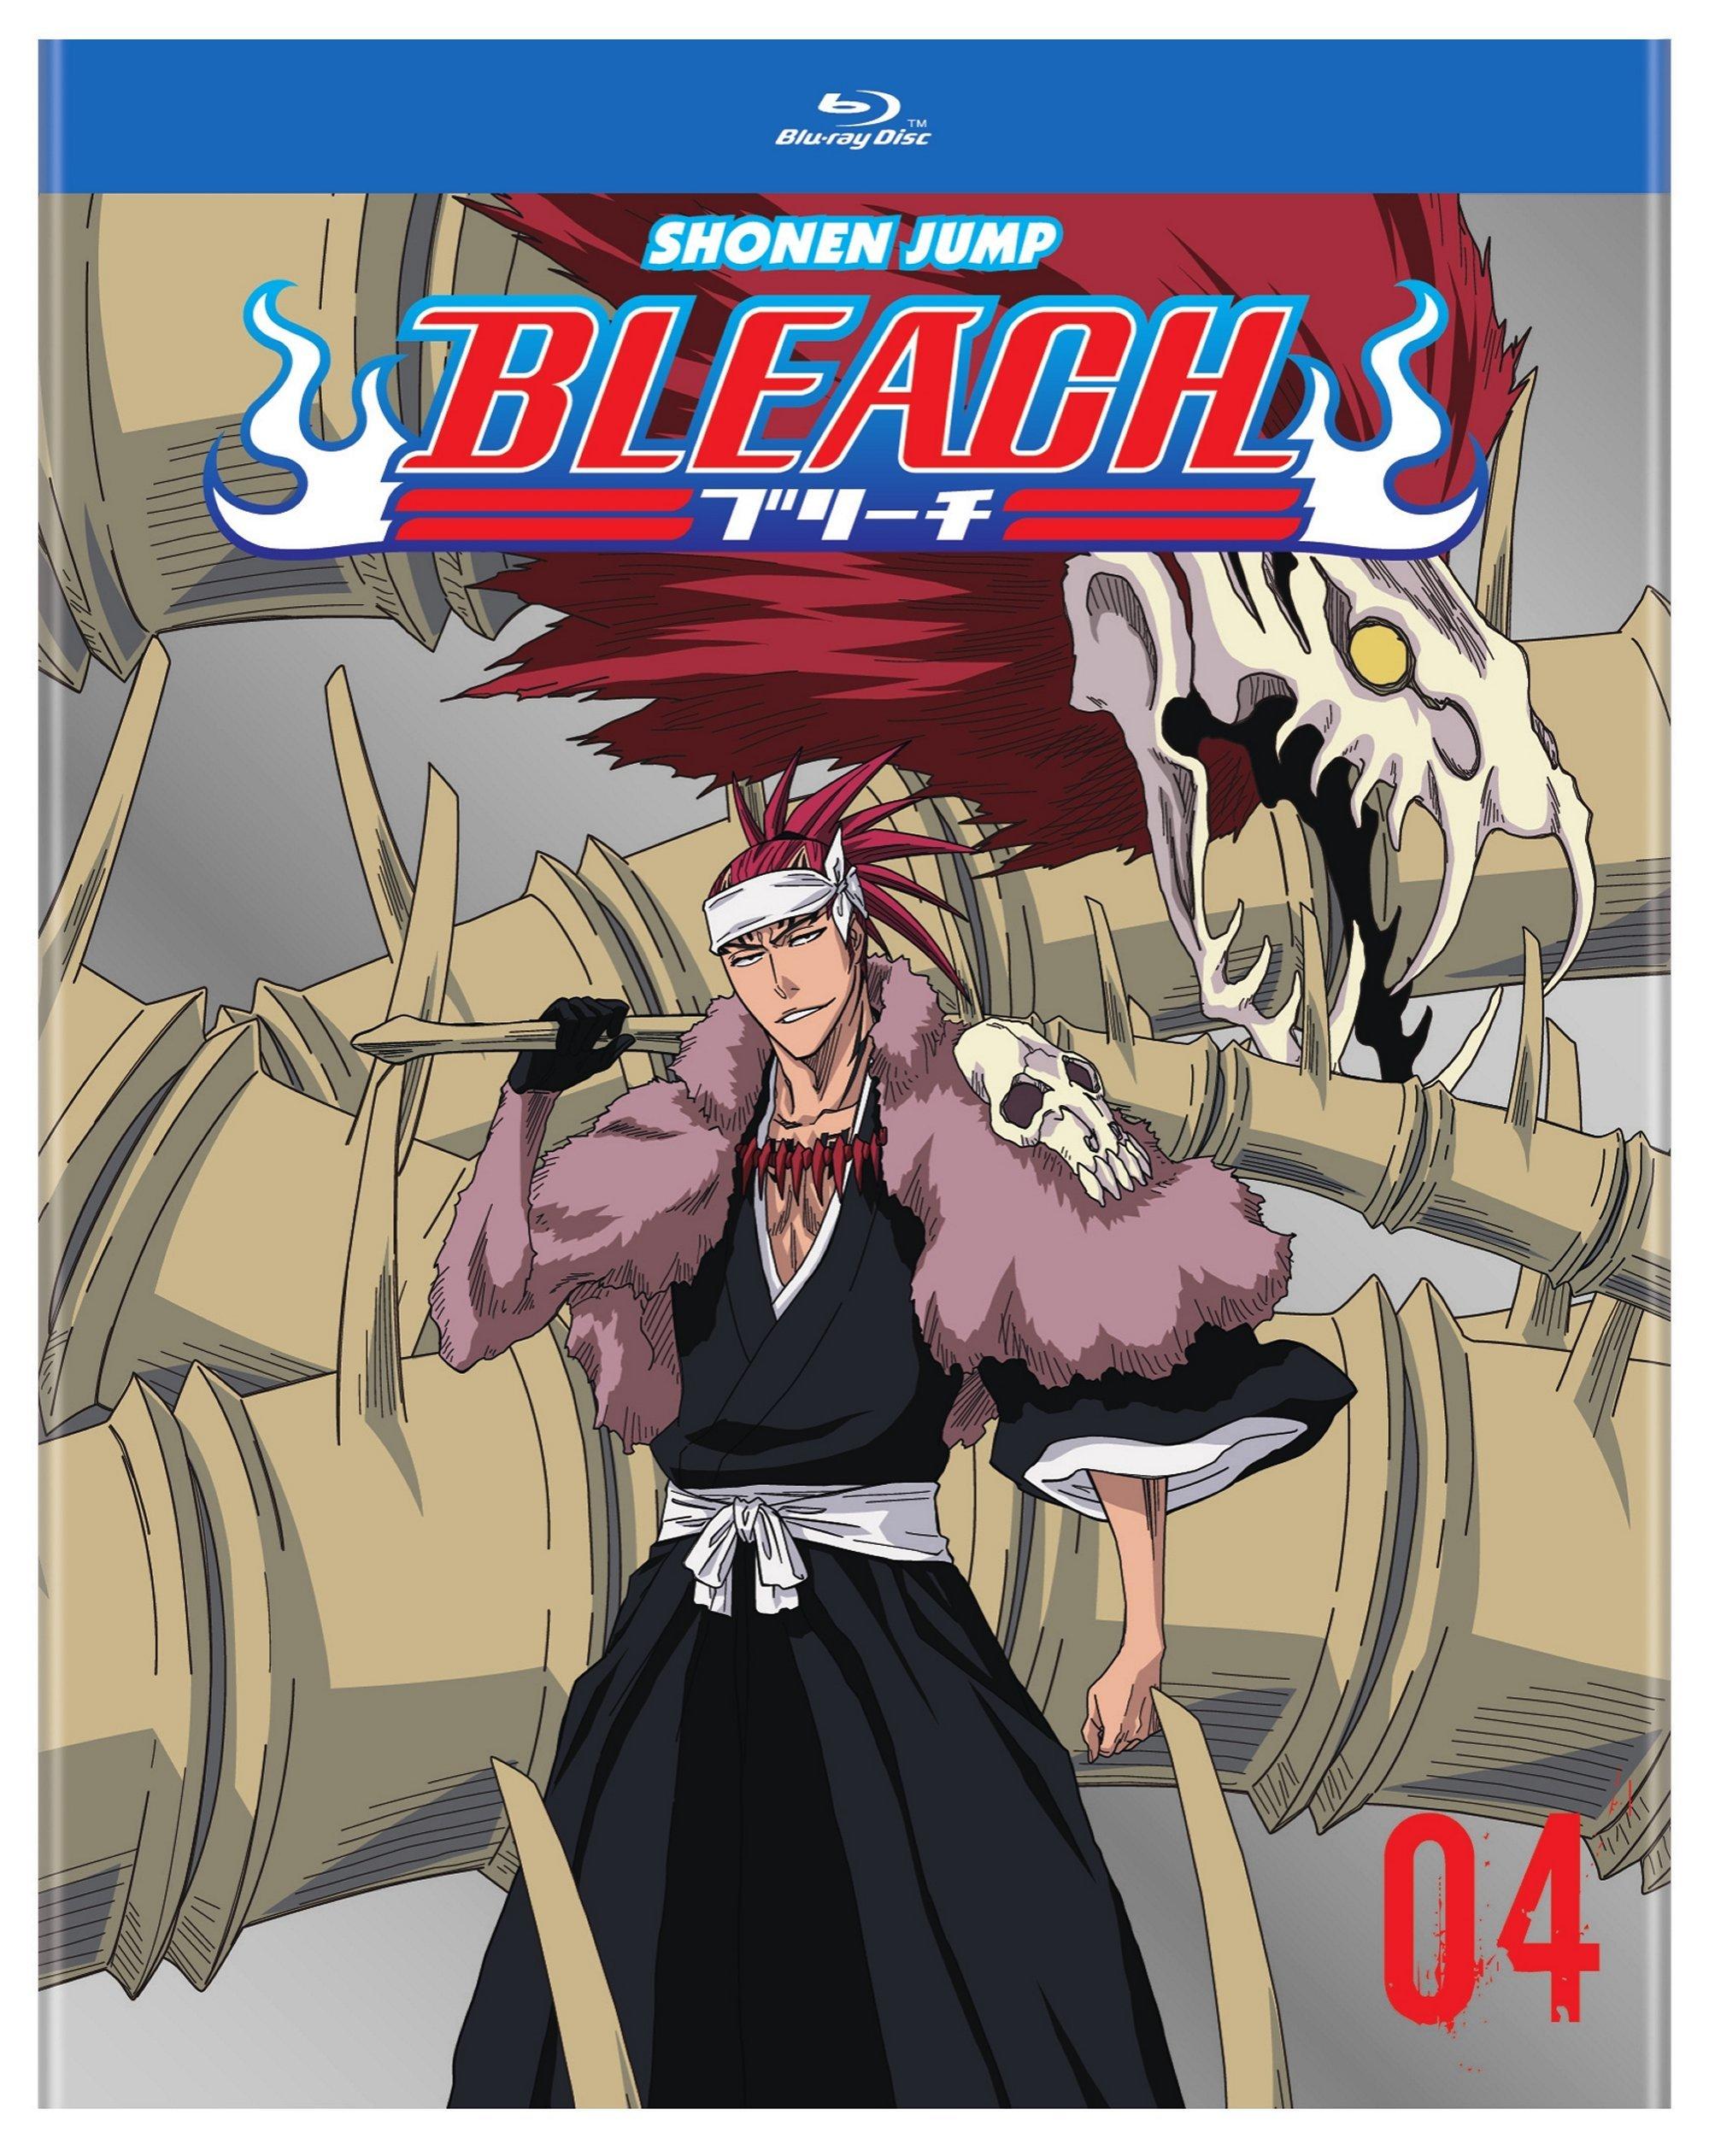 Bleach (TV) Set 4 (BD) [Blu-ray] by Viz Media